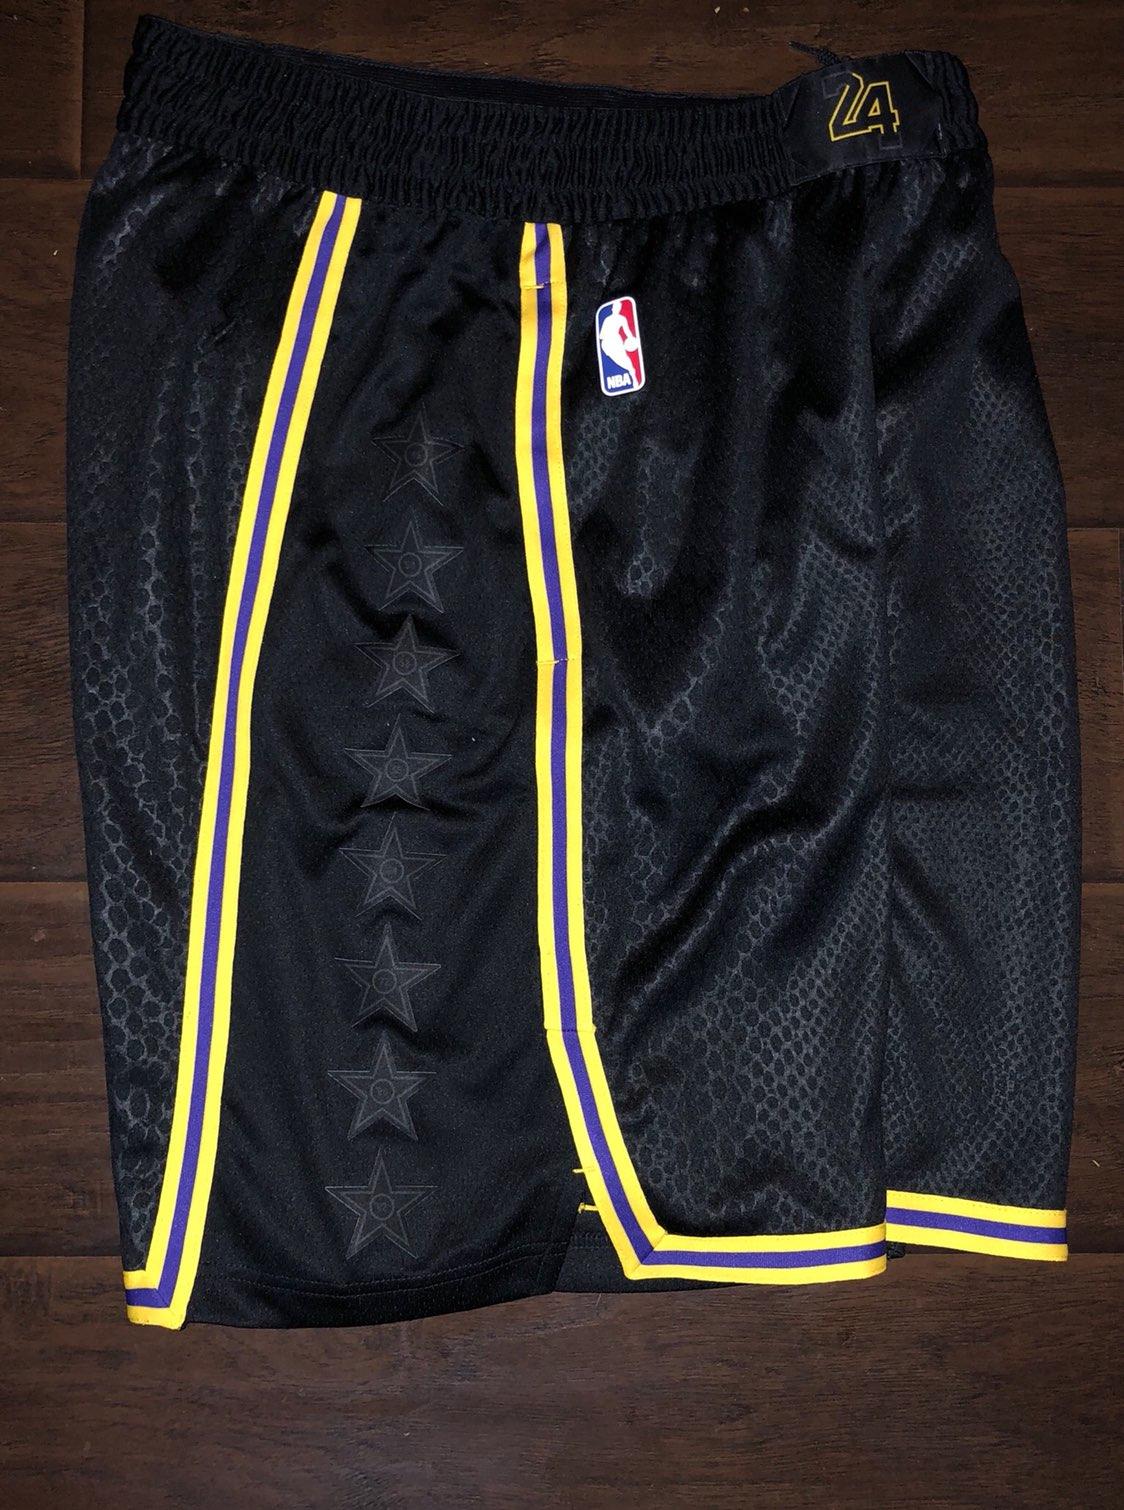 kobe bryant shorts